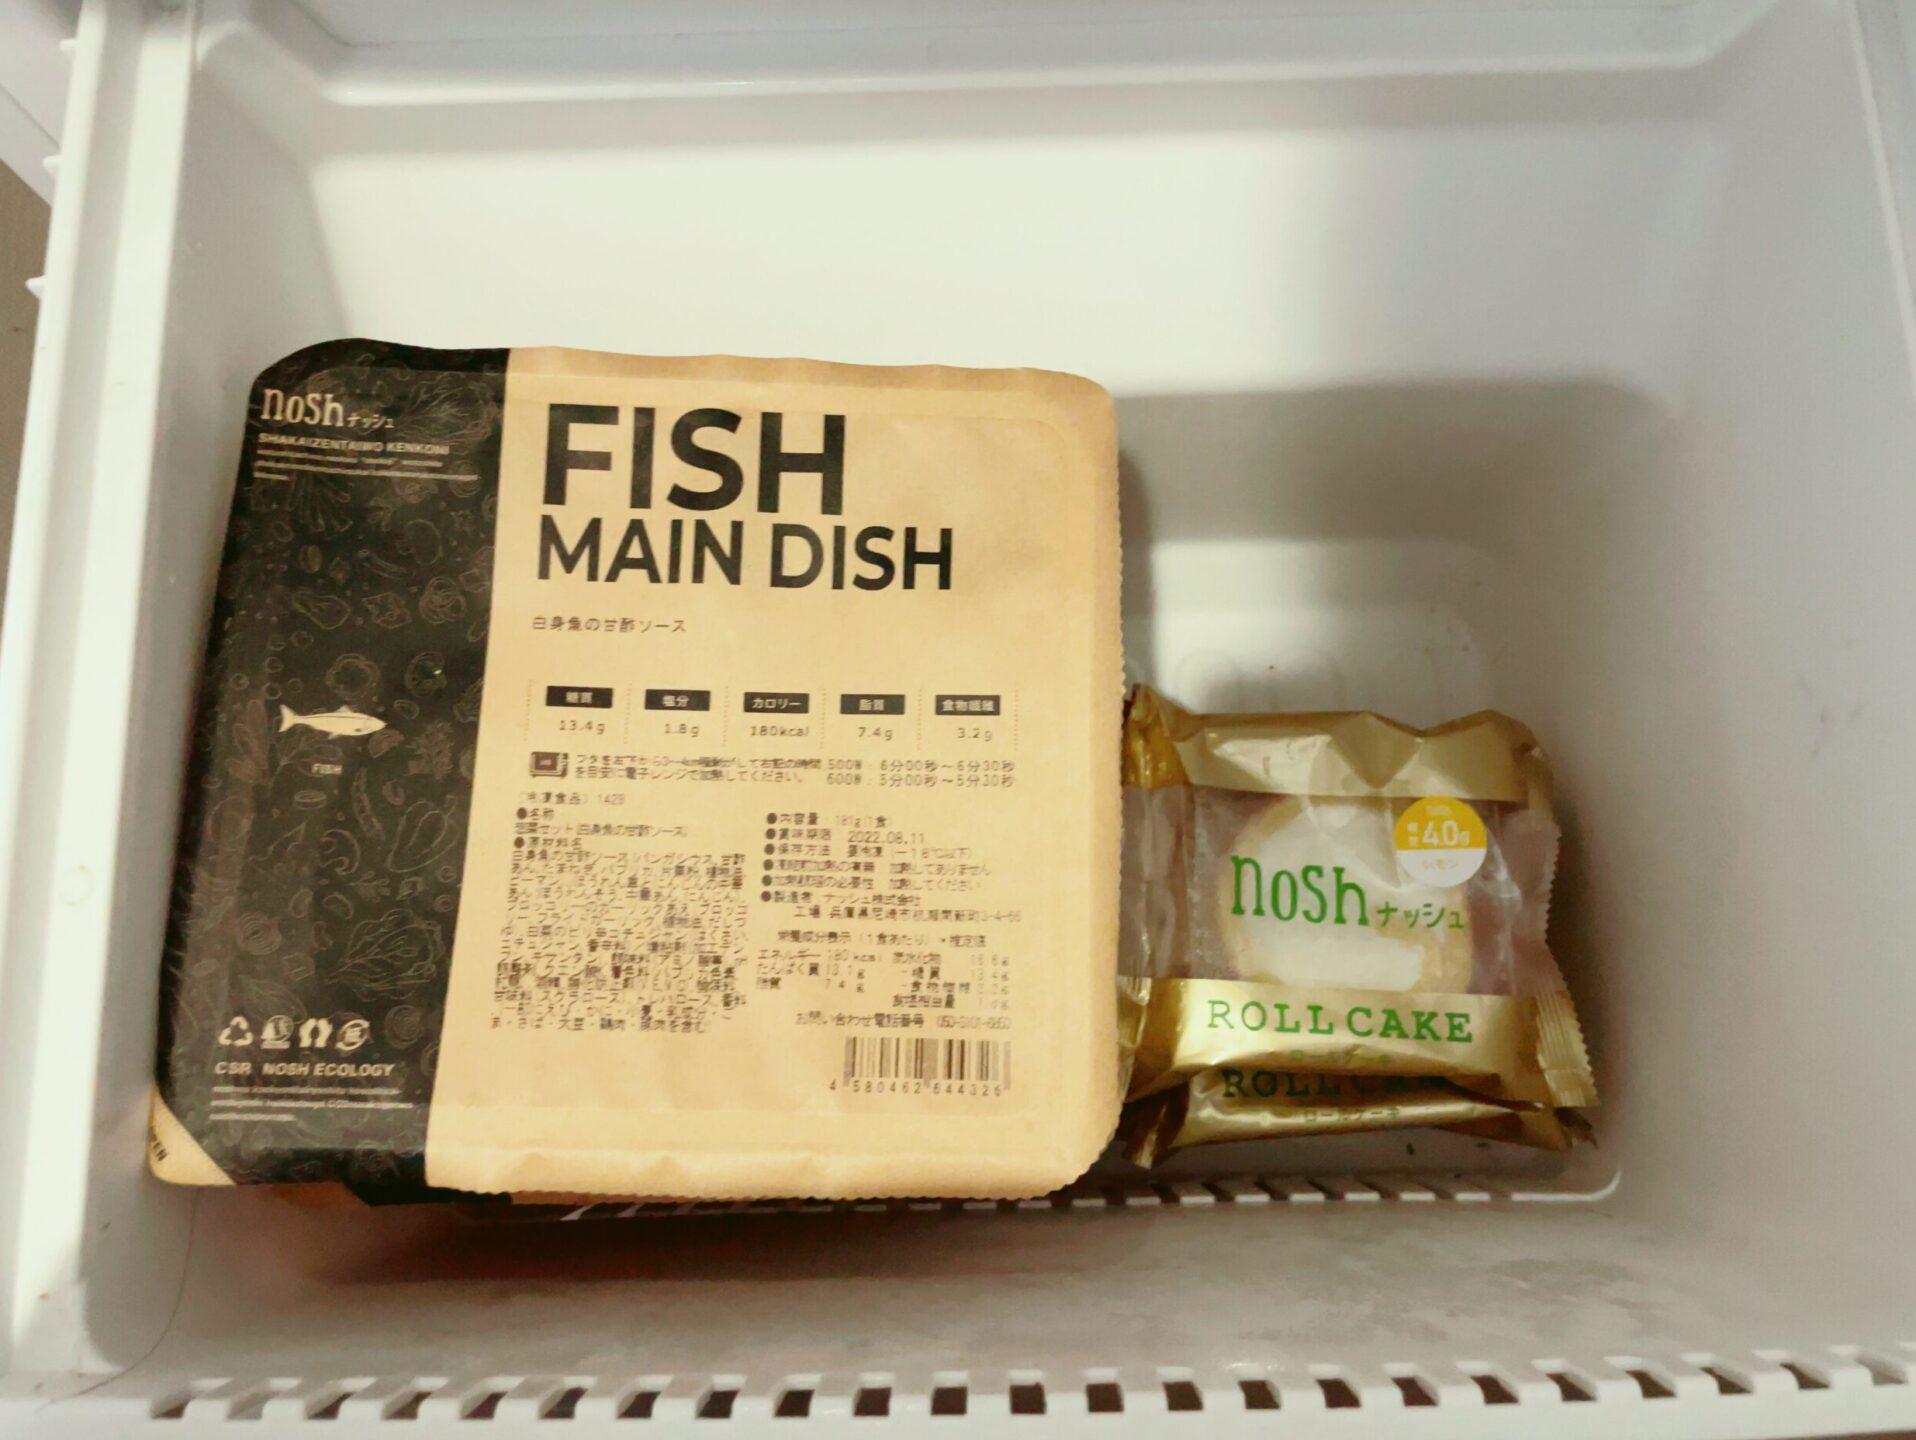 nosh(ナッシュ)を冷凍庫に入れてみた